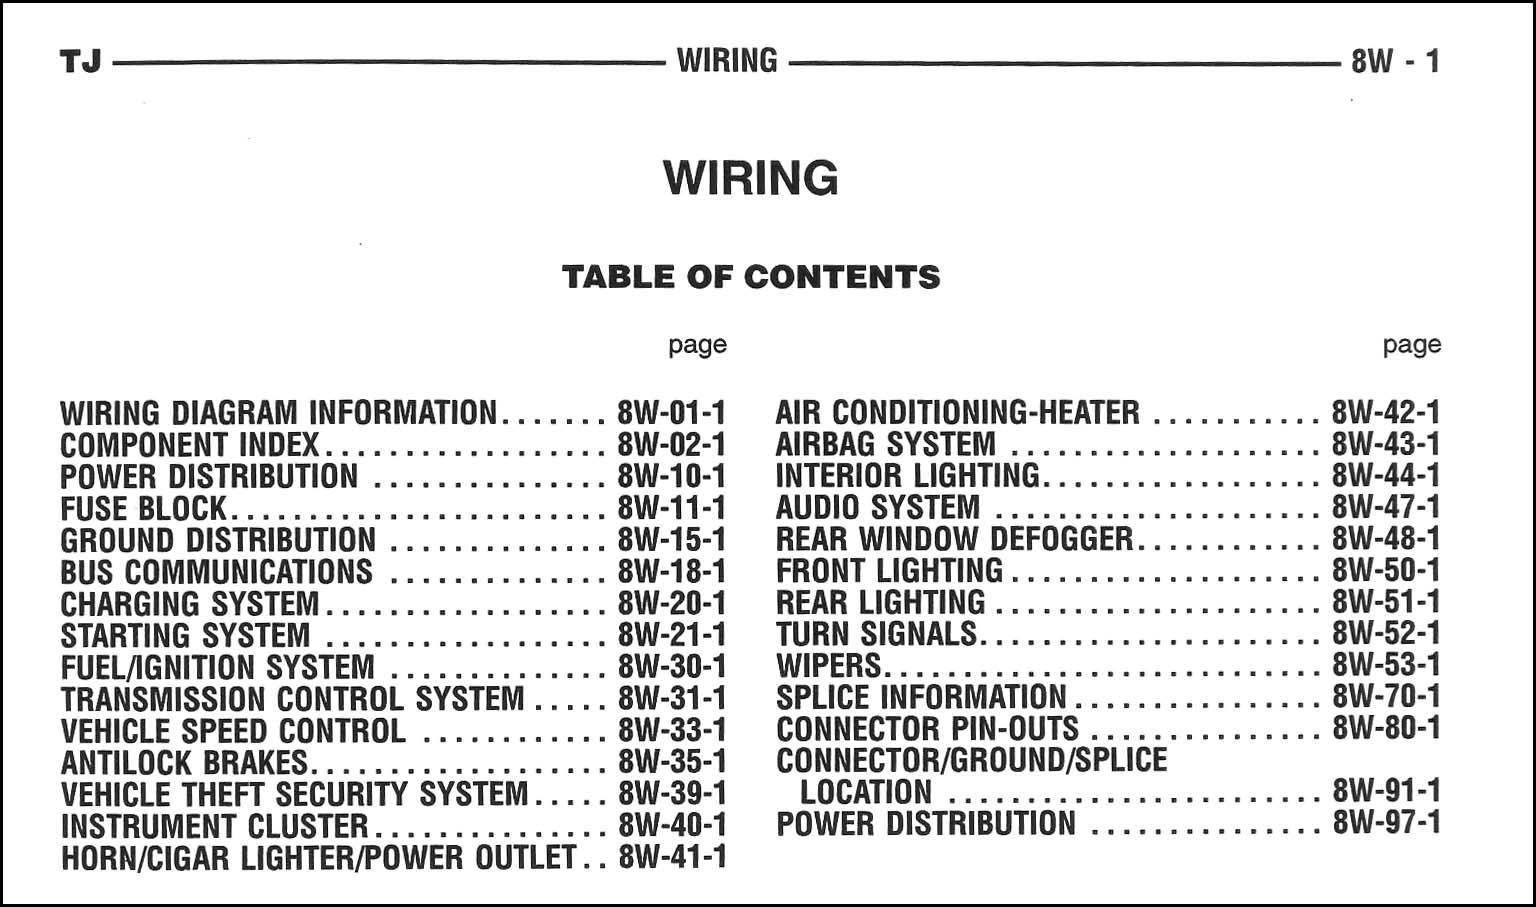 wrangler speaker wiring diagram 584 2005 jeep wrangler tj radio wiring diagram wiring resources  584 2005 jeep wrangler tj radio wiring